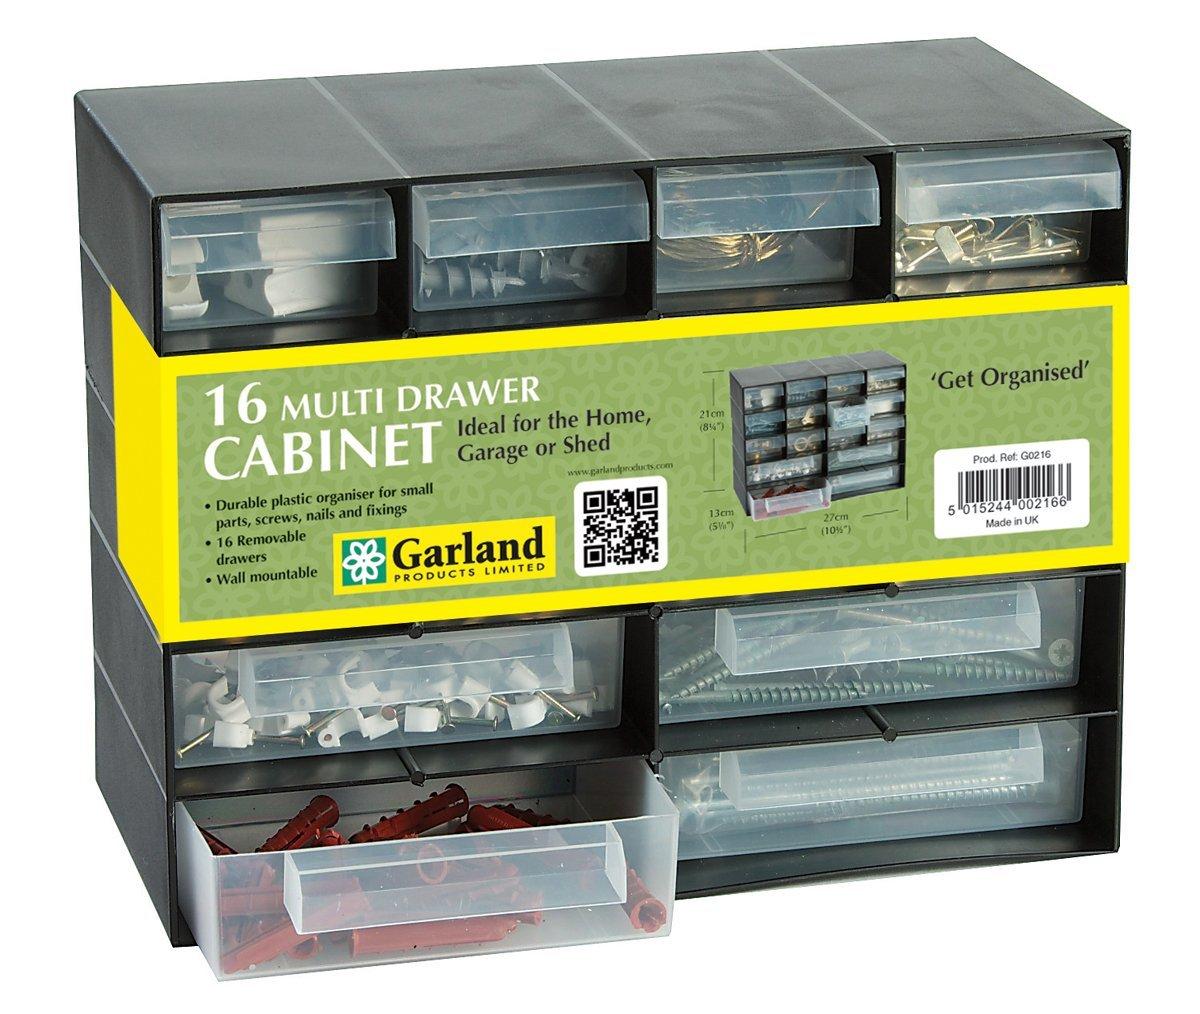 Craft storage drawers plastic - Hobby Craft Storage Drawers Plastic 16 Multi Drawer Storage Cabinet Organiser For Home Garage Diy